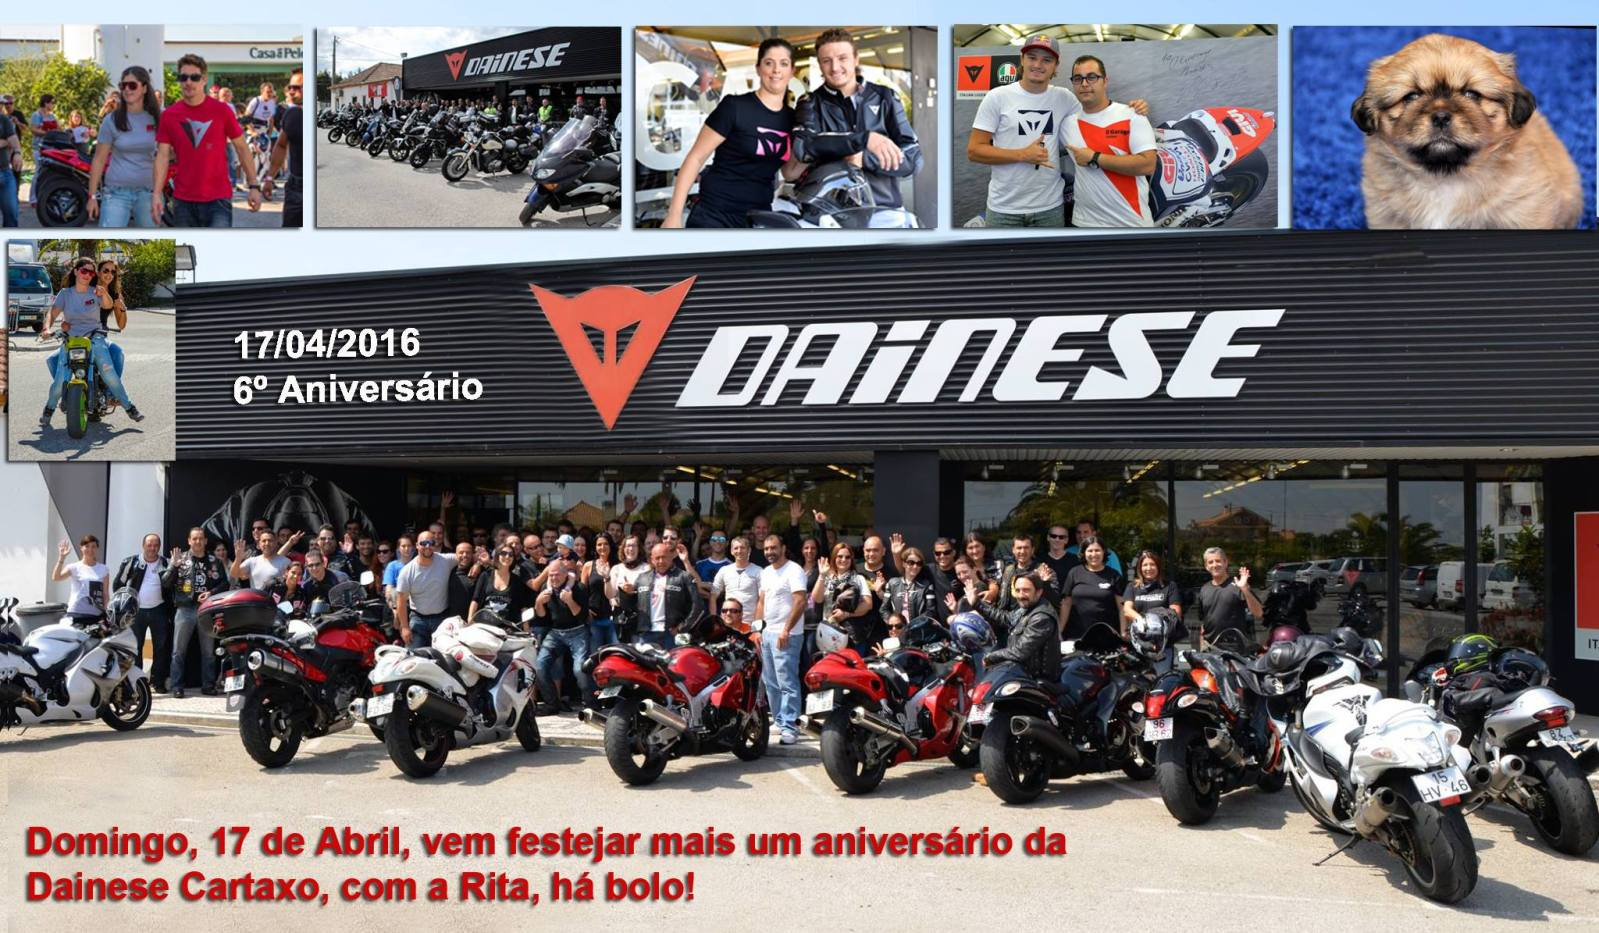 Aniversário Dainese - Cartaxo [17.04.2016] Domingo Nzlp9l